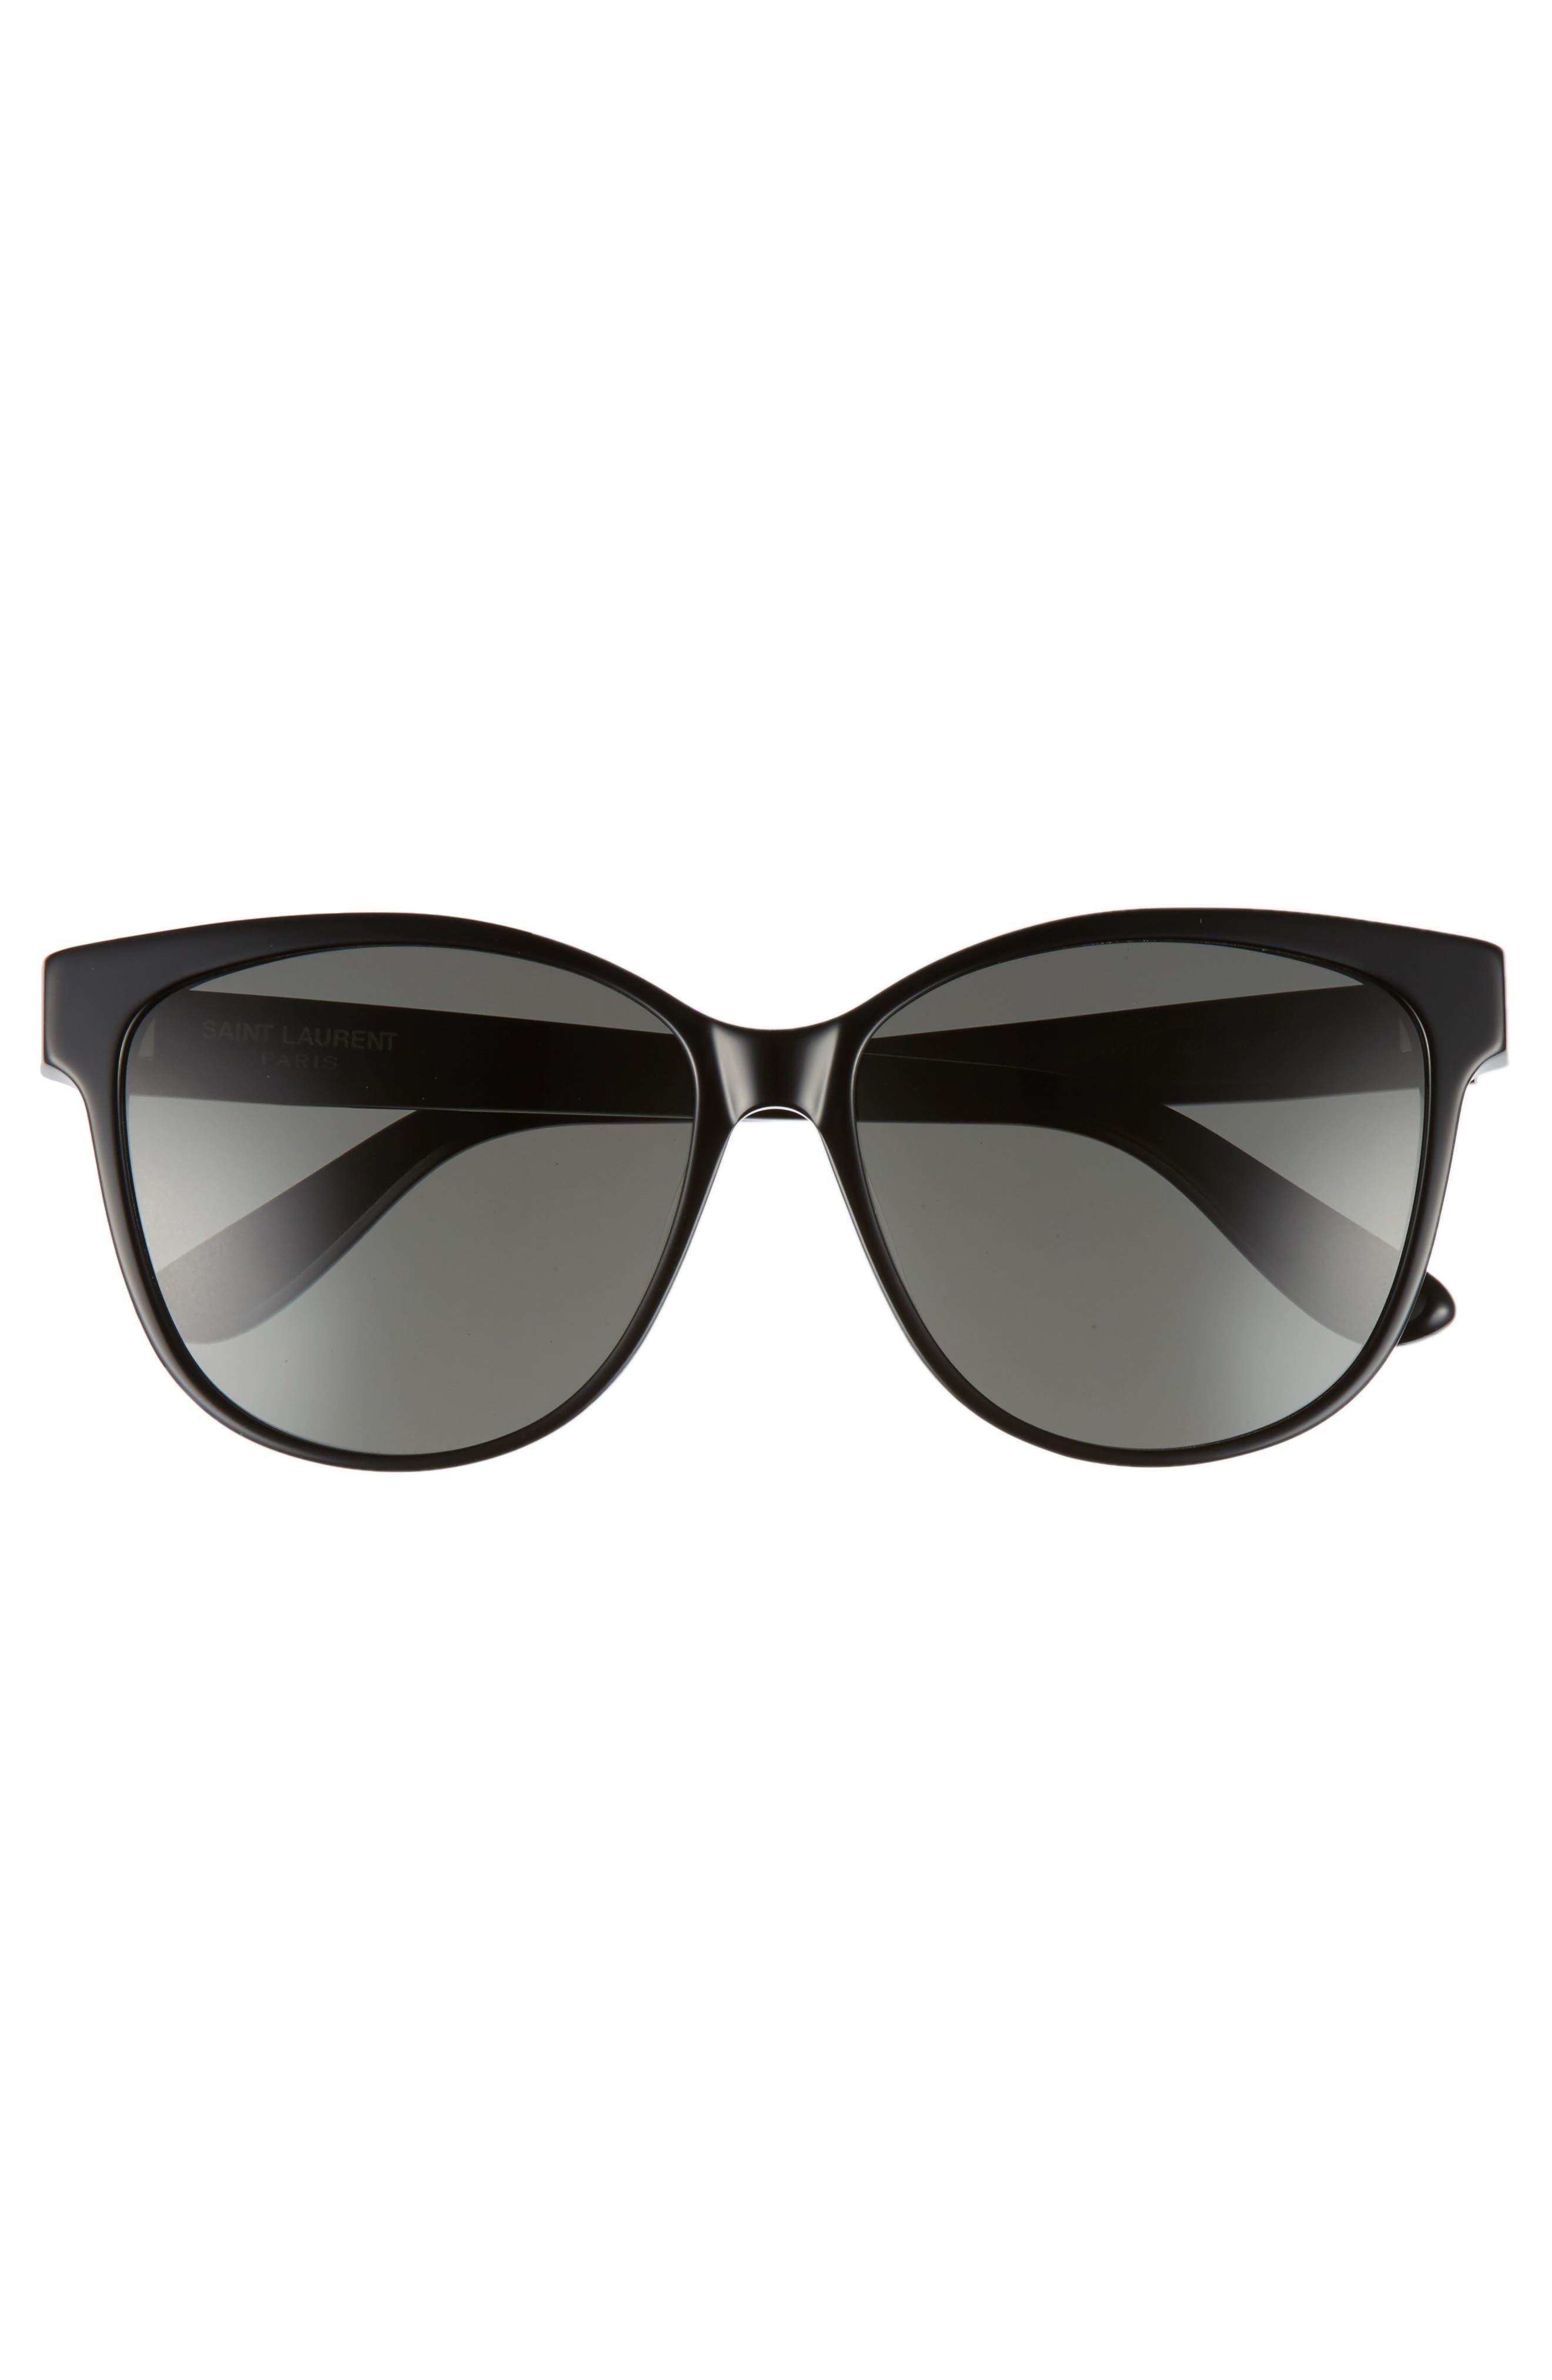 SAINT LAURENT, 58mm Cat Eye Sunglasses, Alternate thumbnail 3, color, BLACK